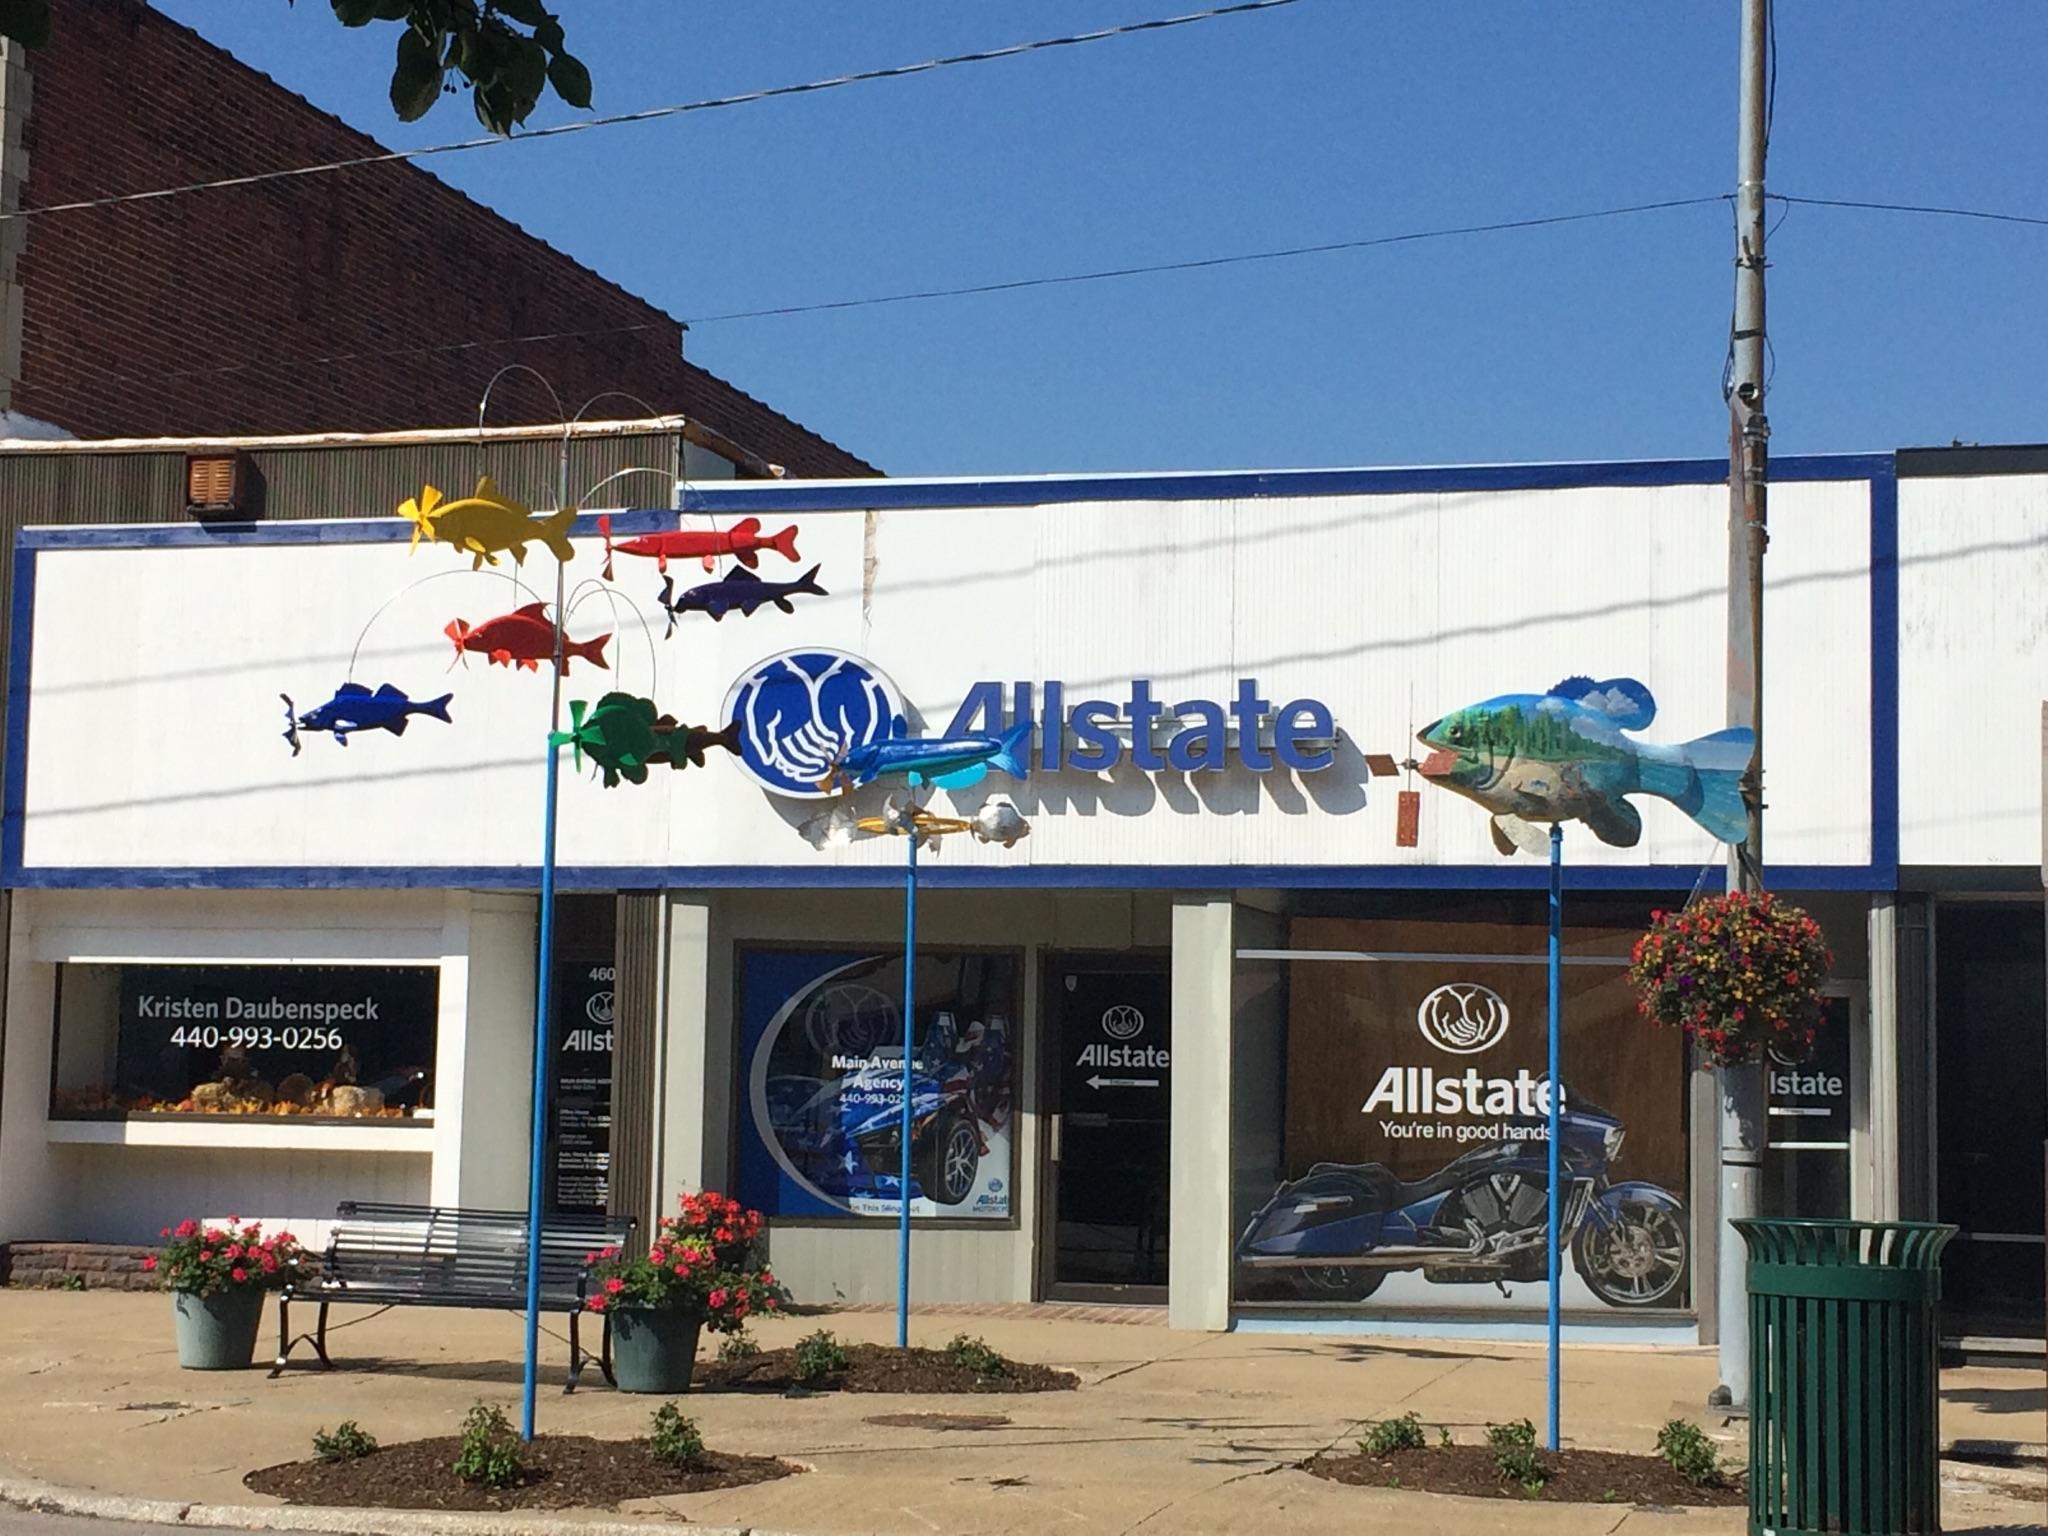 Allstate Insurance Agent: Kristen Daubenspeck Barger image 4